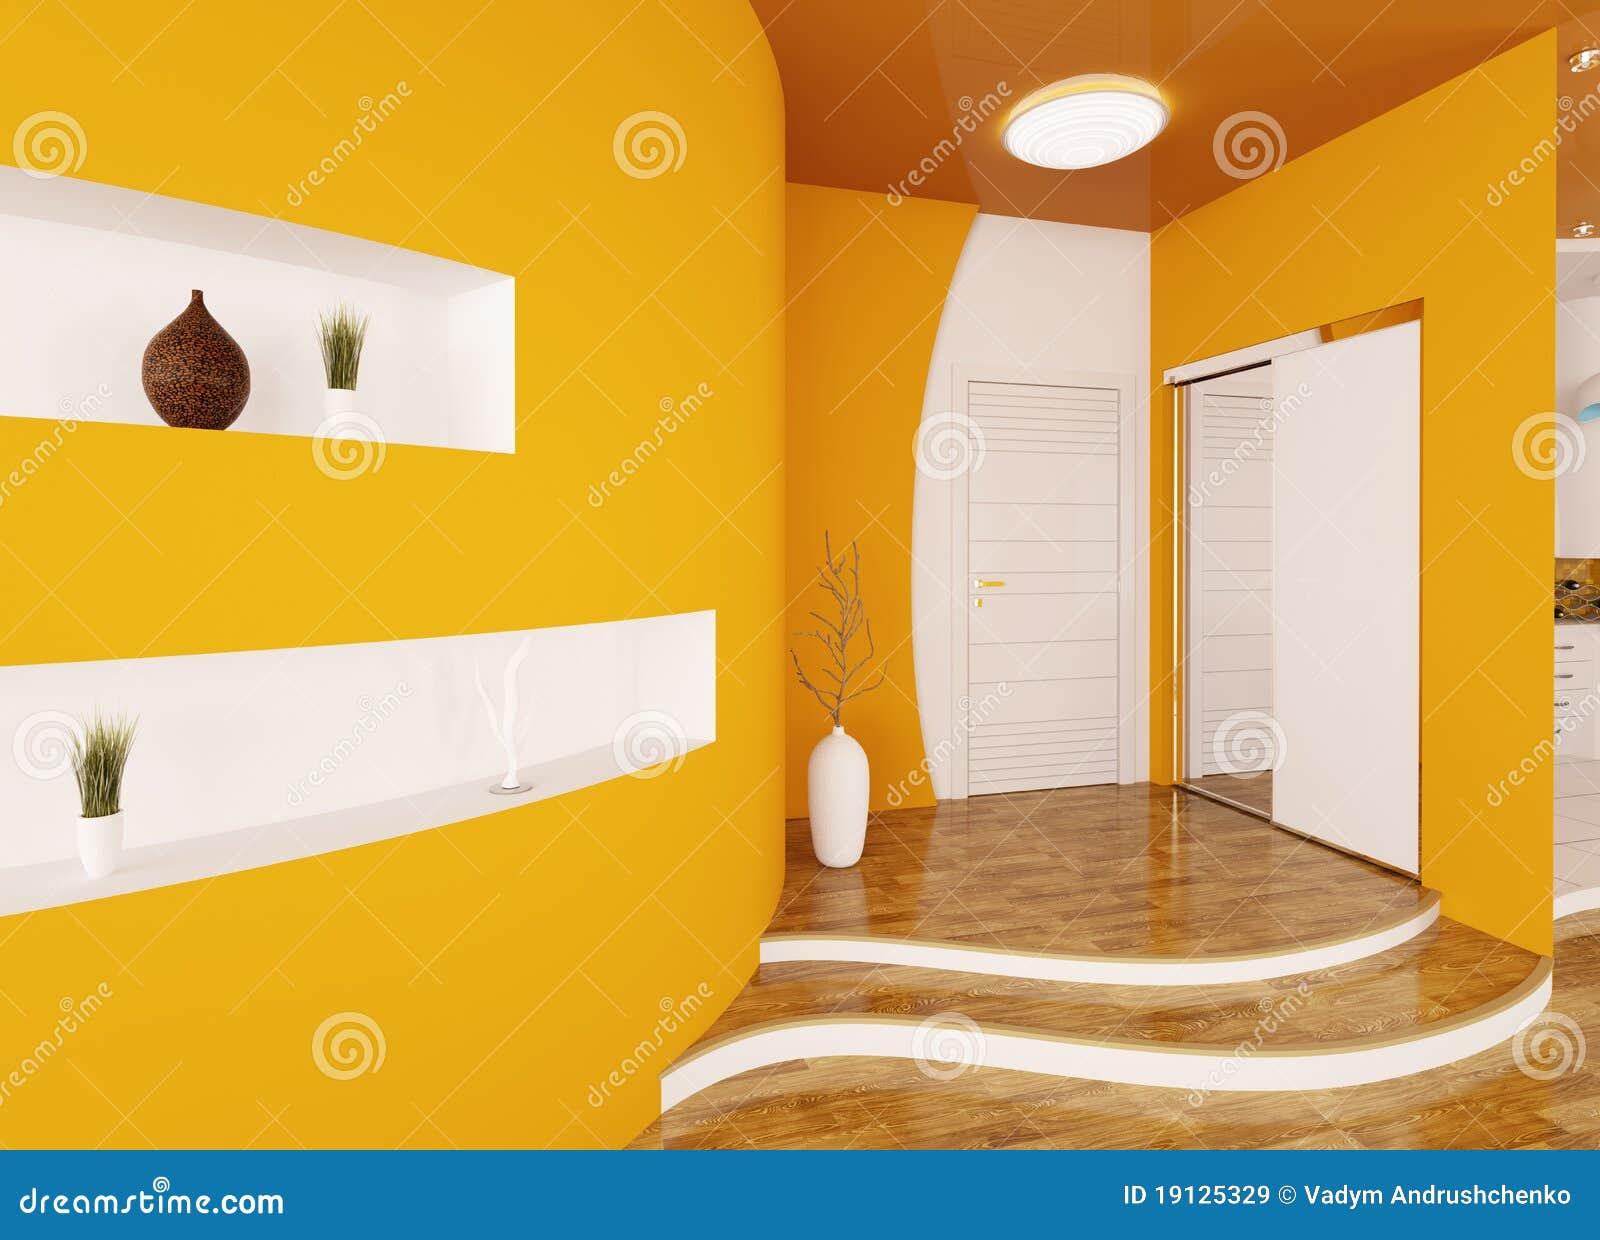 l 39 int rieur moderne du hall d 39 entr e 3d rendent images libres de droits image 19125329. Black Bedroom Furniture Sets. Home Design Ideas